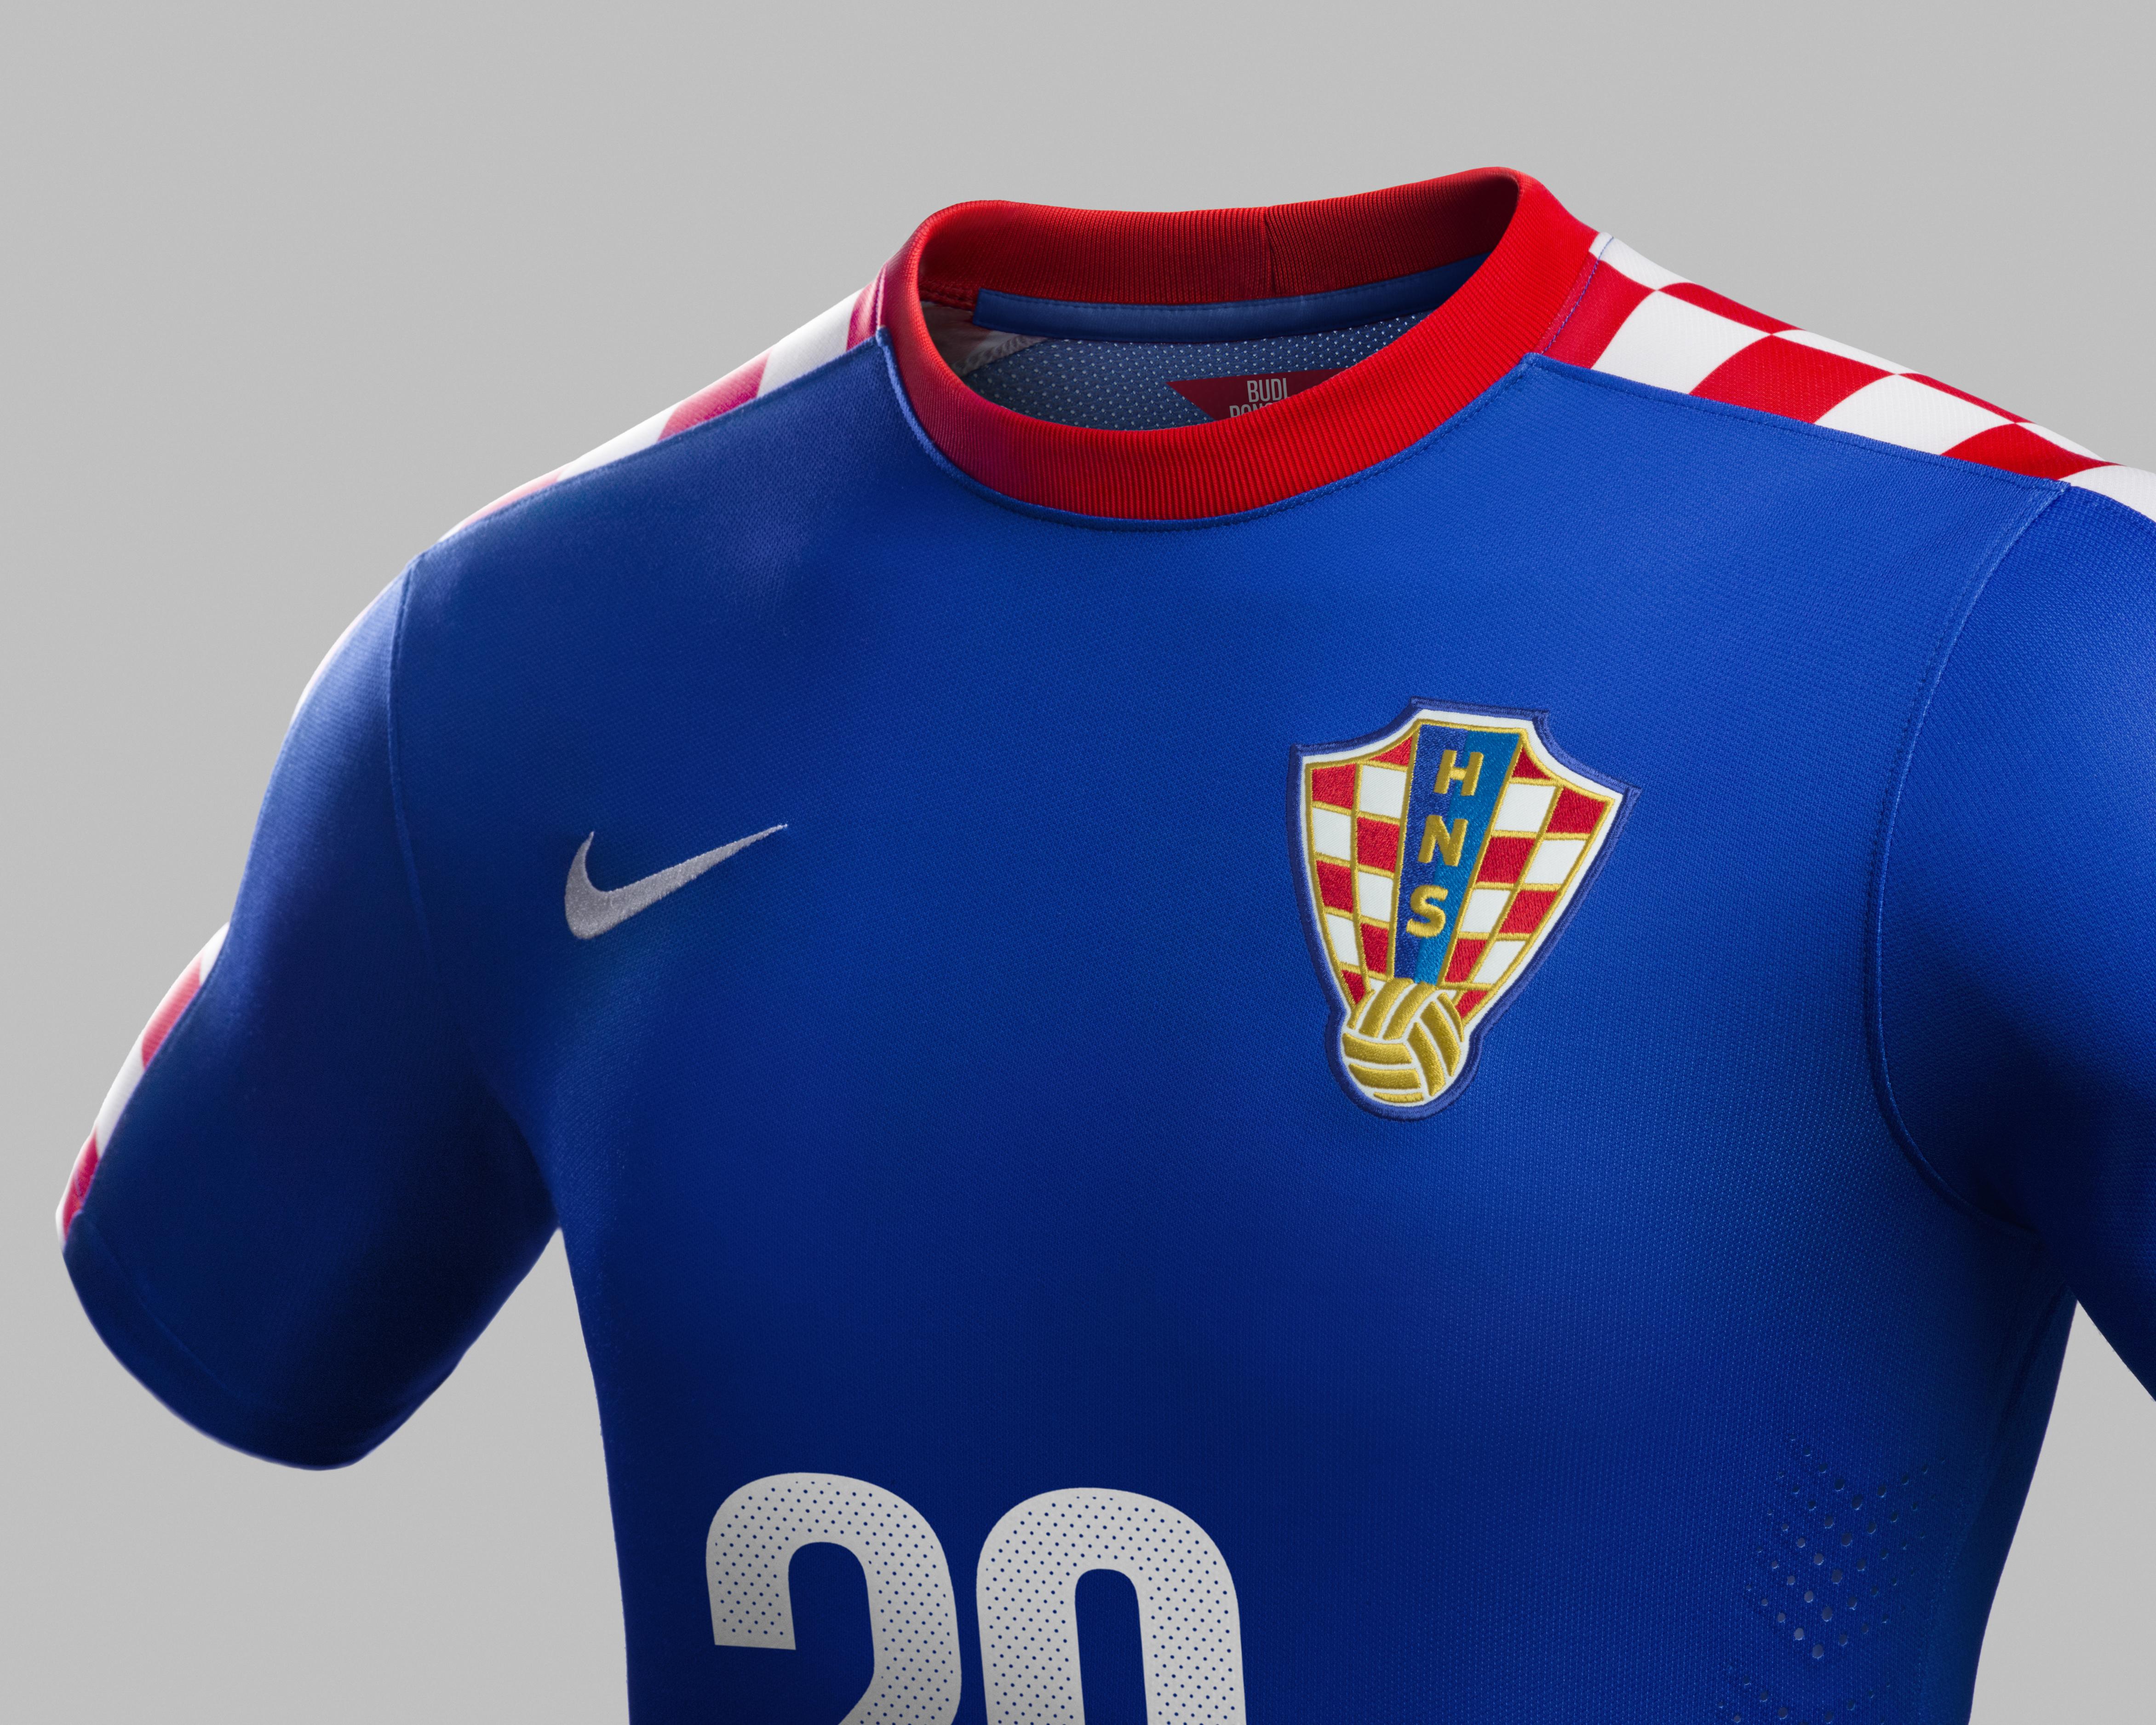 2fa365731 ... (Mandzukic 17) Nike Football Unveils 2014 Croatia National Team Kit -  Nike ...